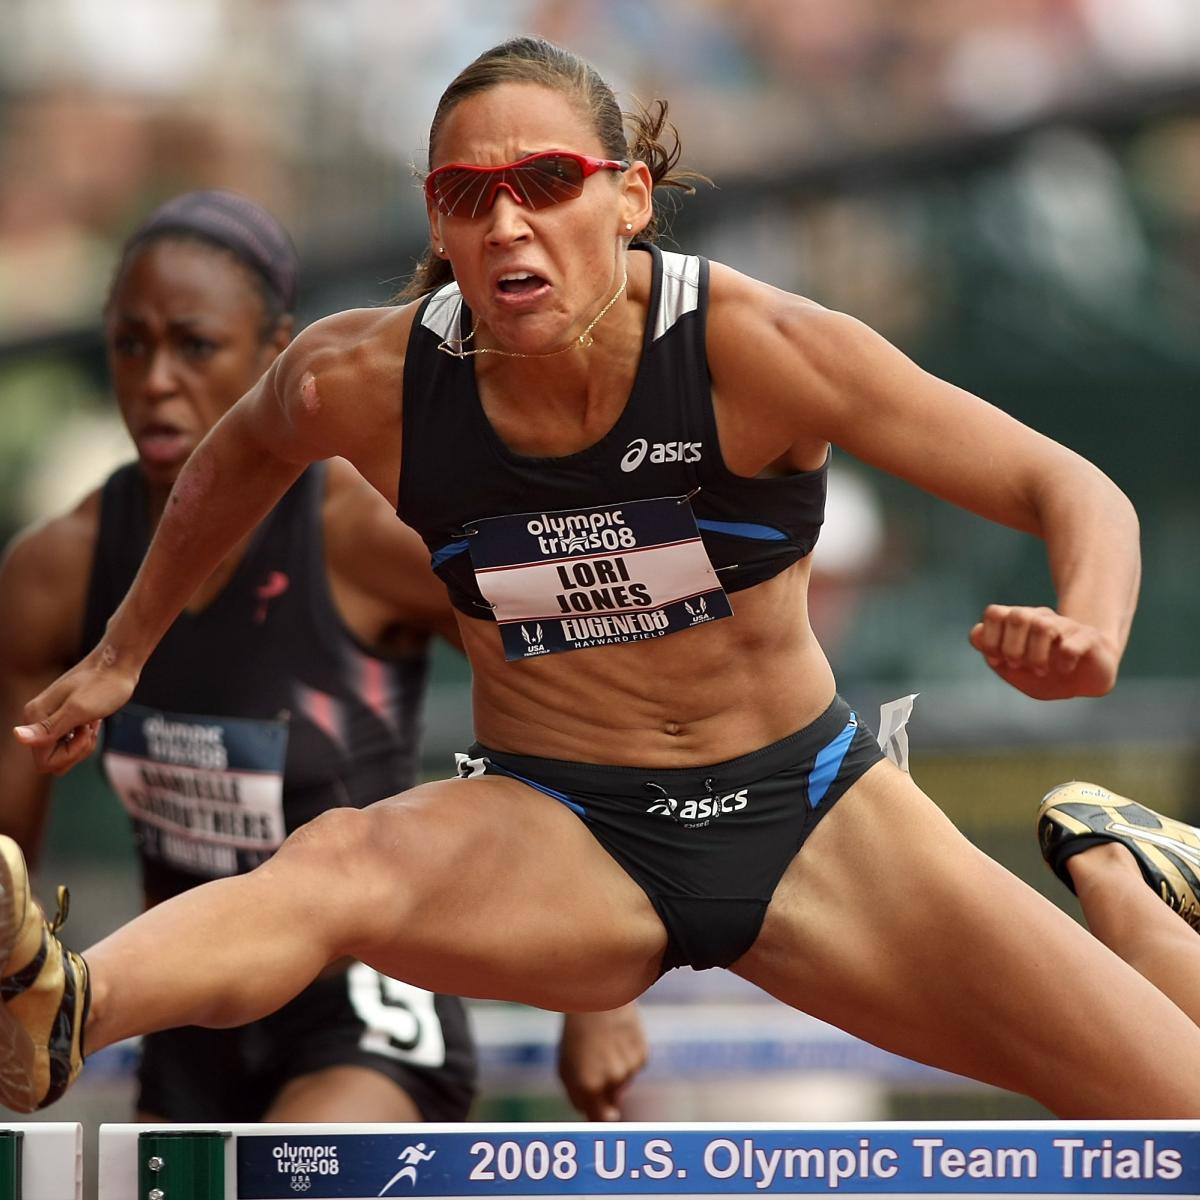 olympic hurdler jones crossword - HD1200×1200